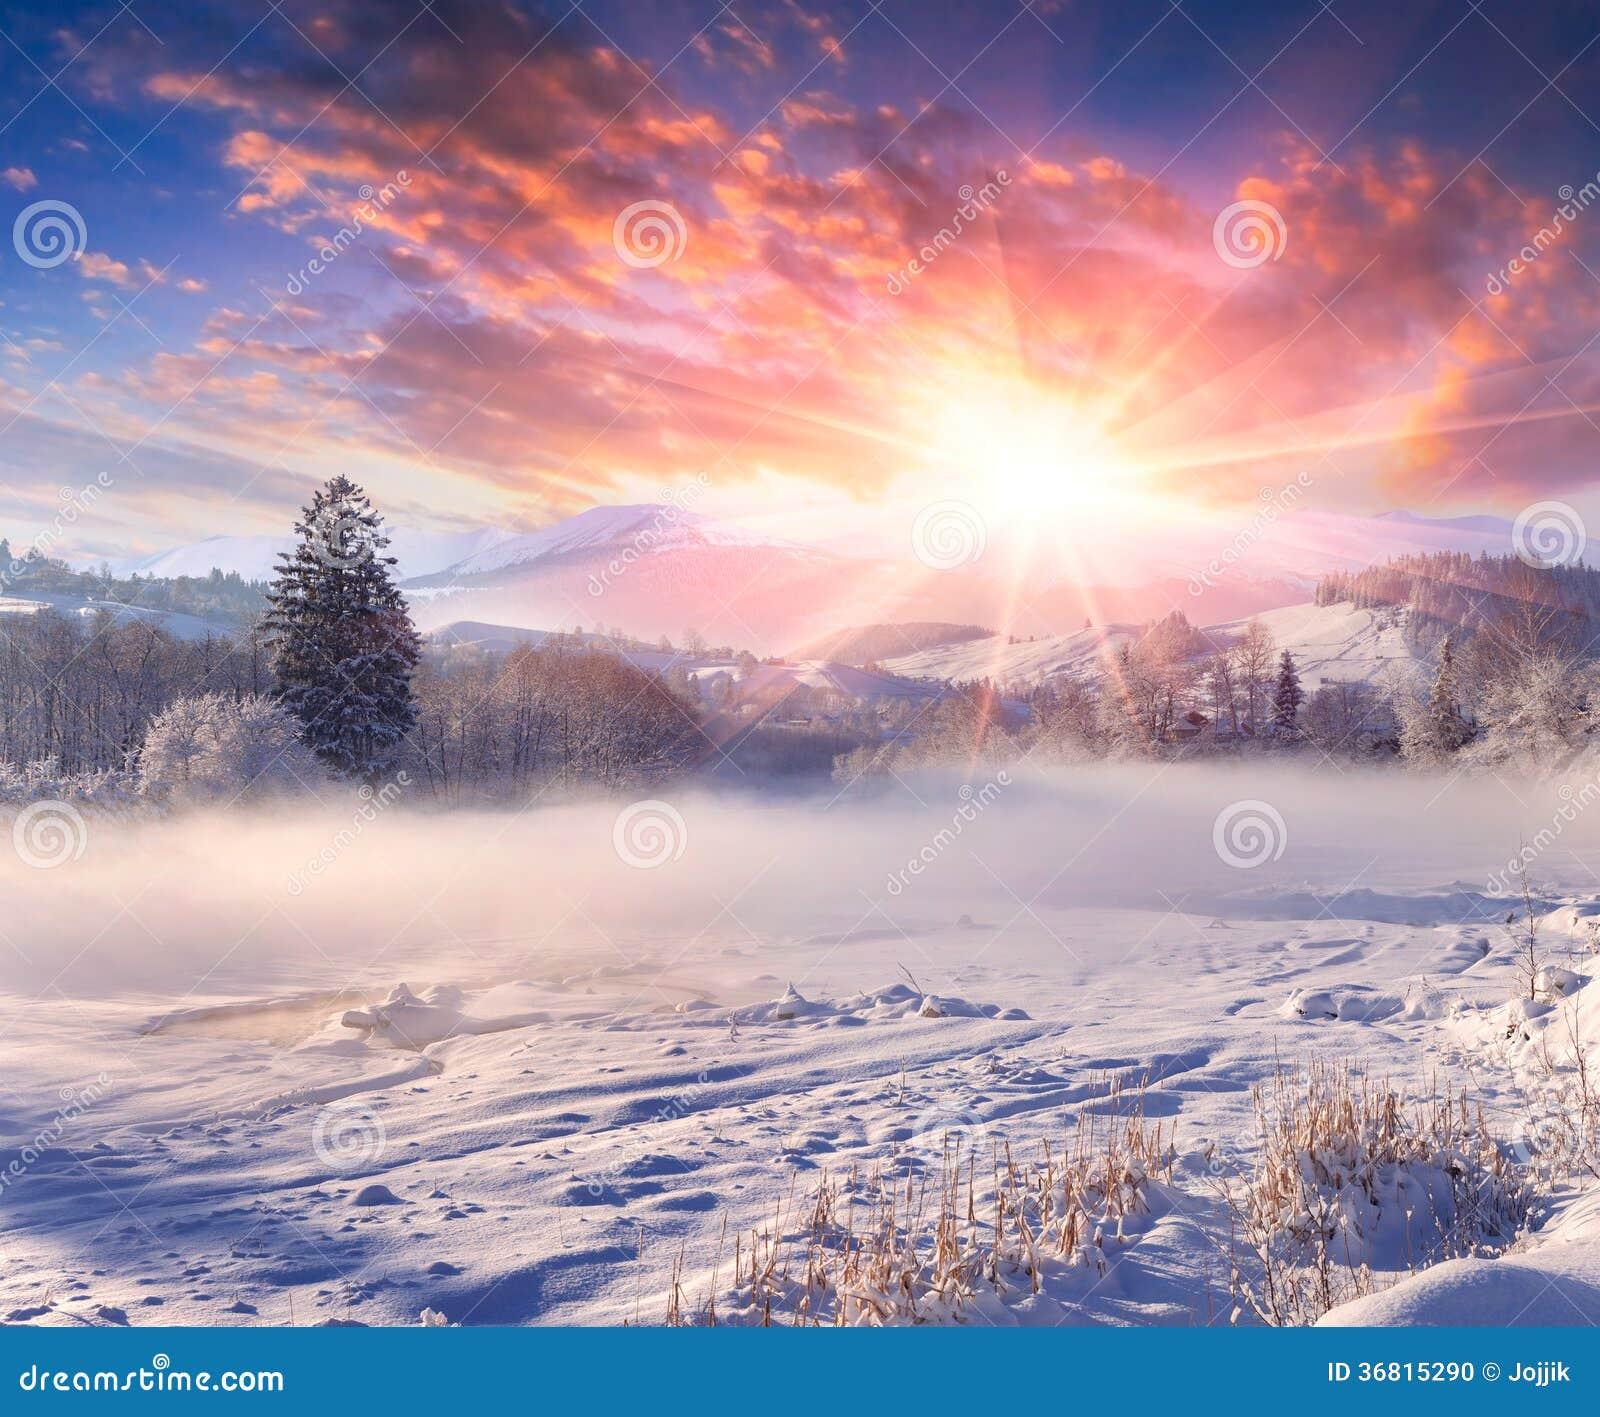 Beautiful winter sunrise in mountain village.